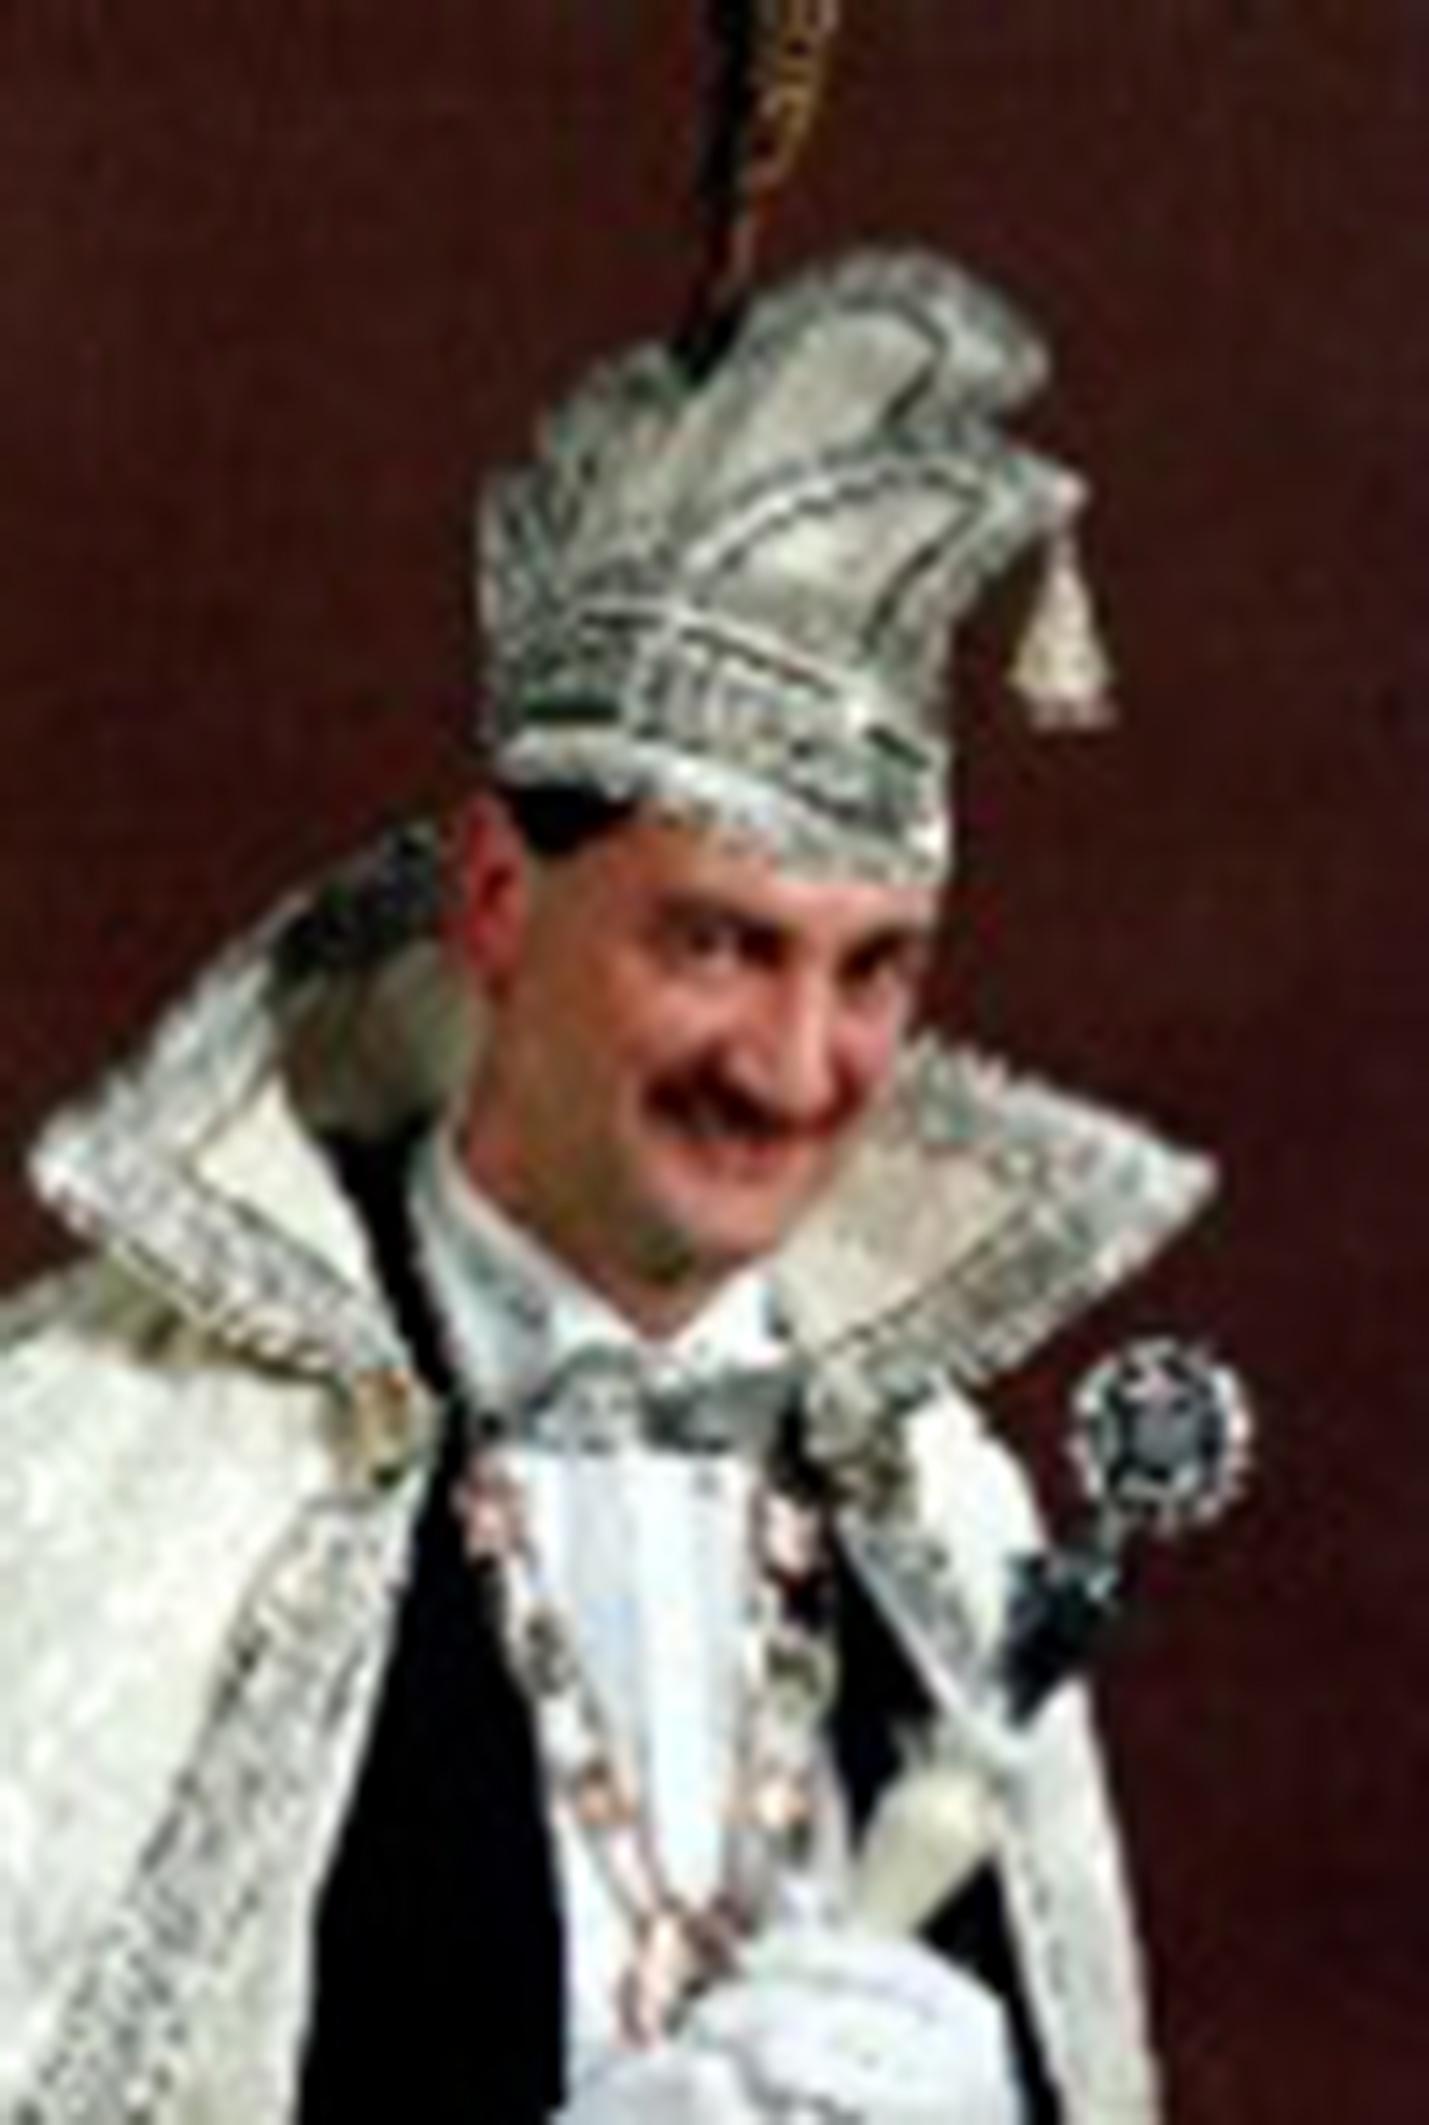 1991 - Sjef Cloudt